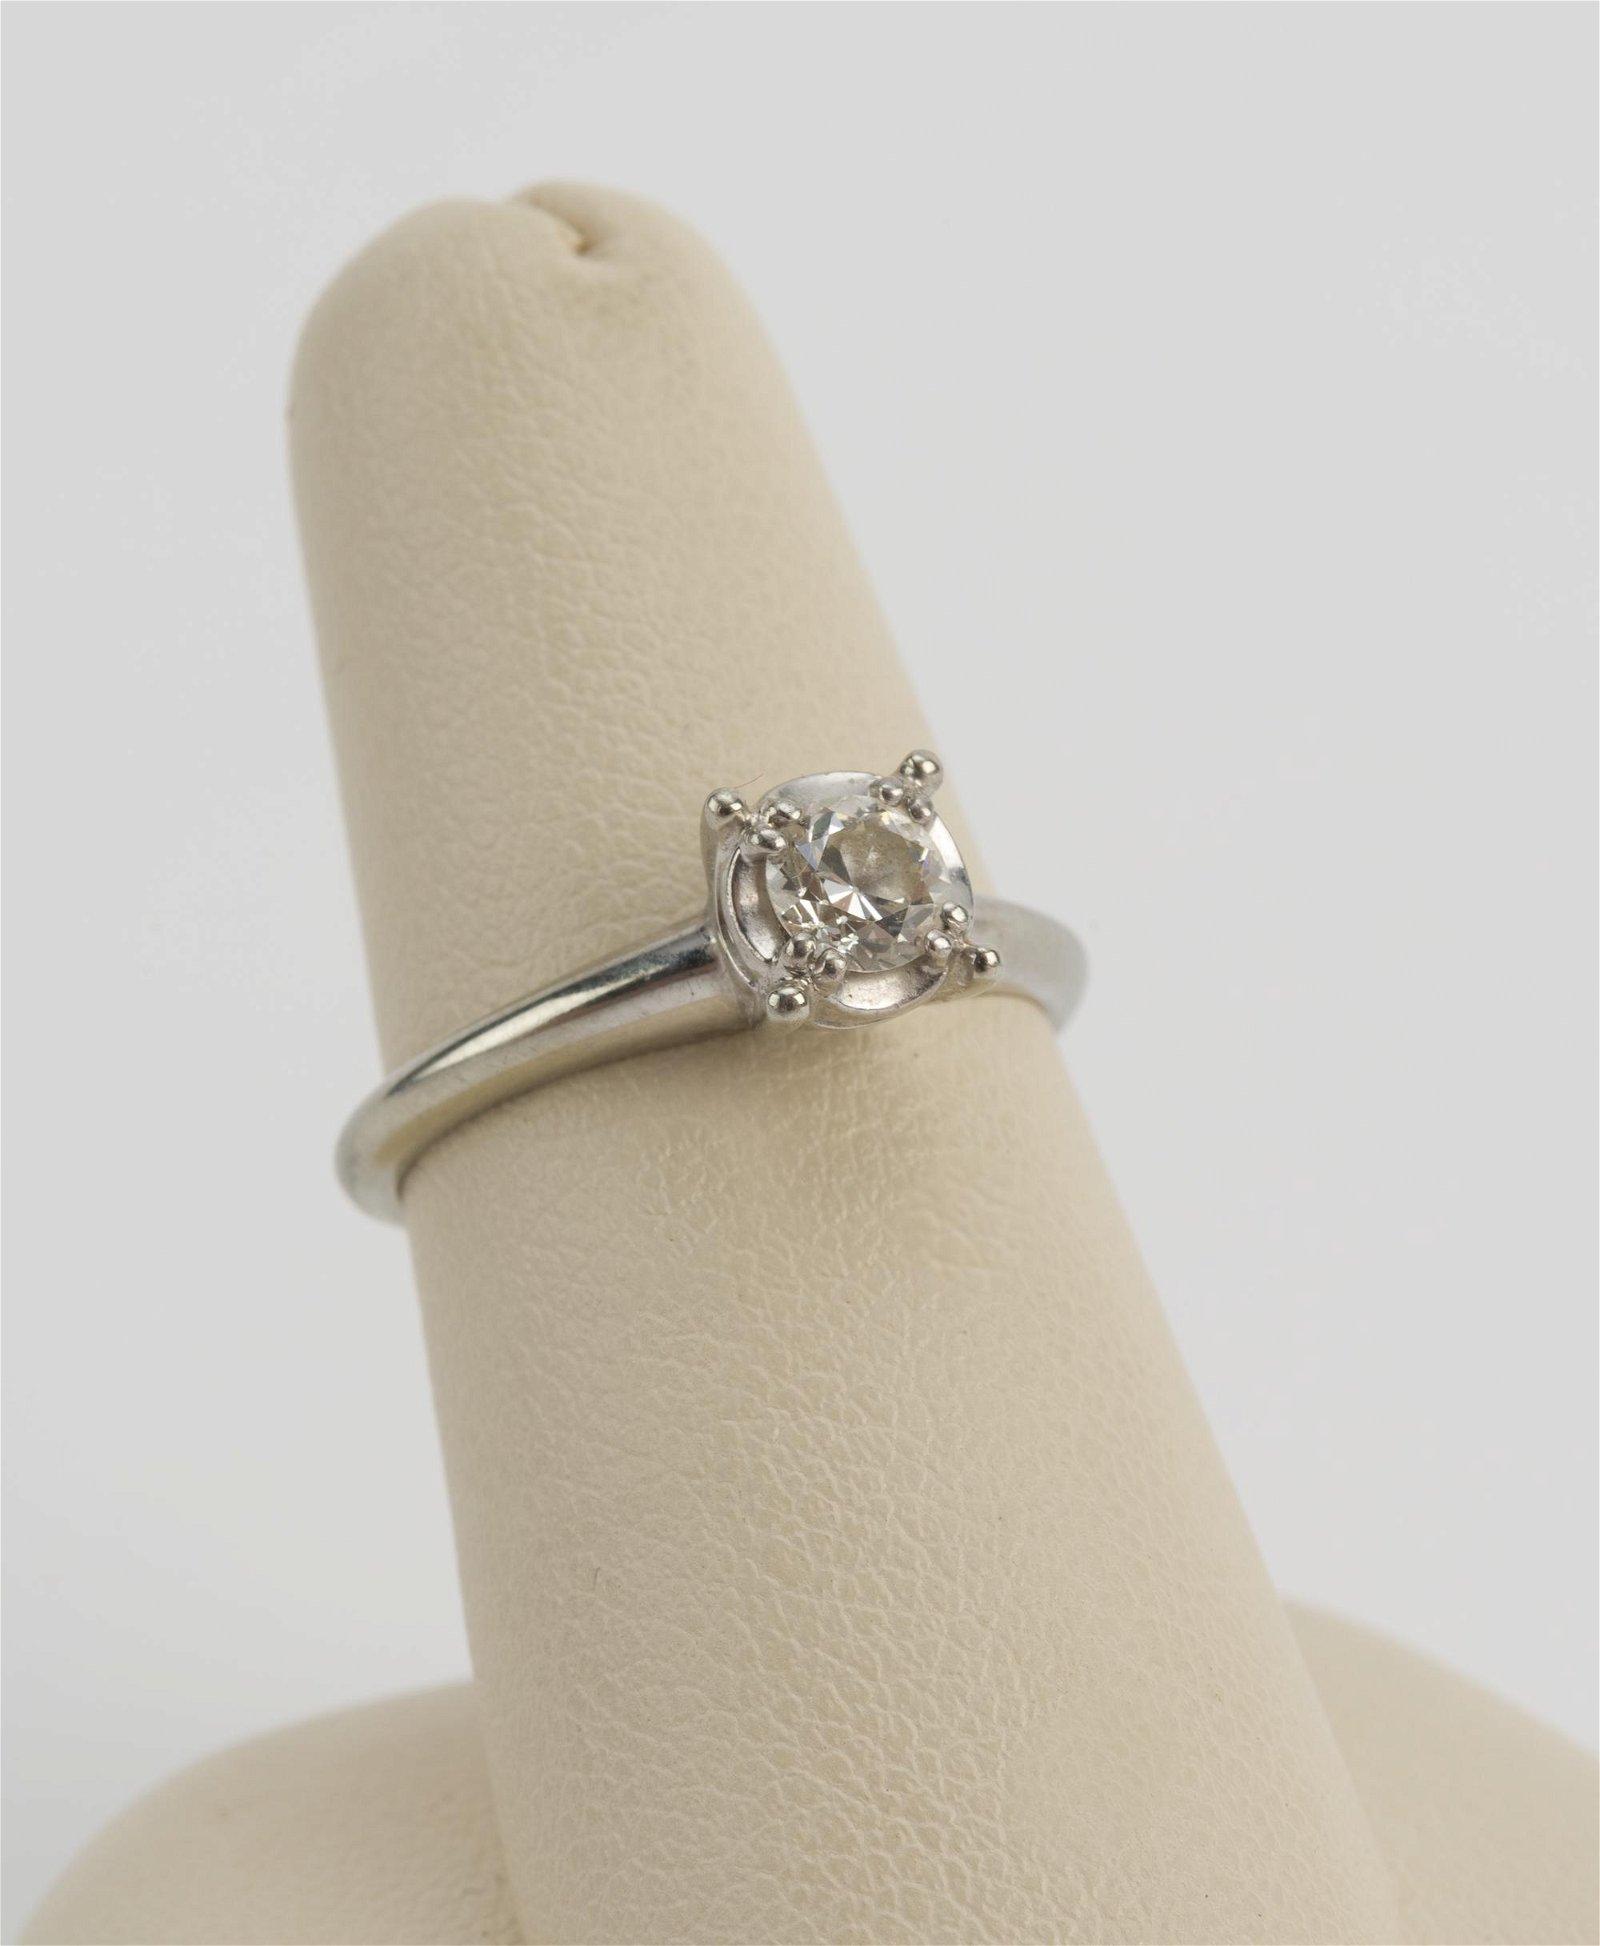 Jabel 18K White Gold Diamond Solitaire Ring